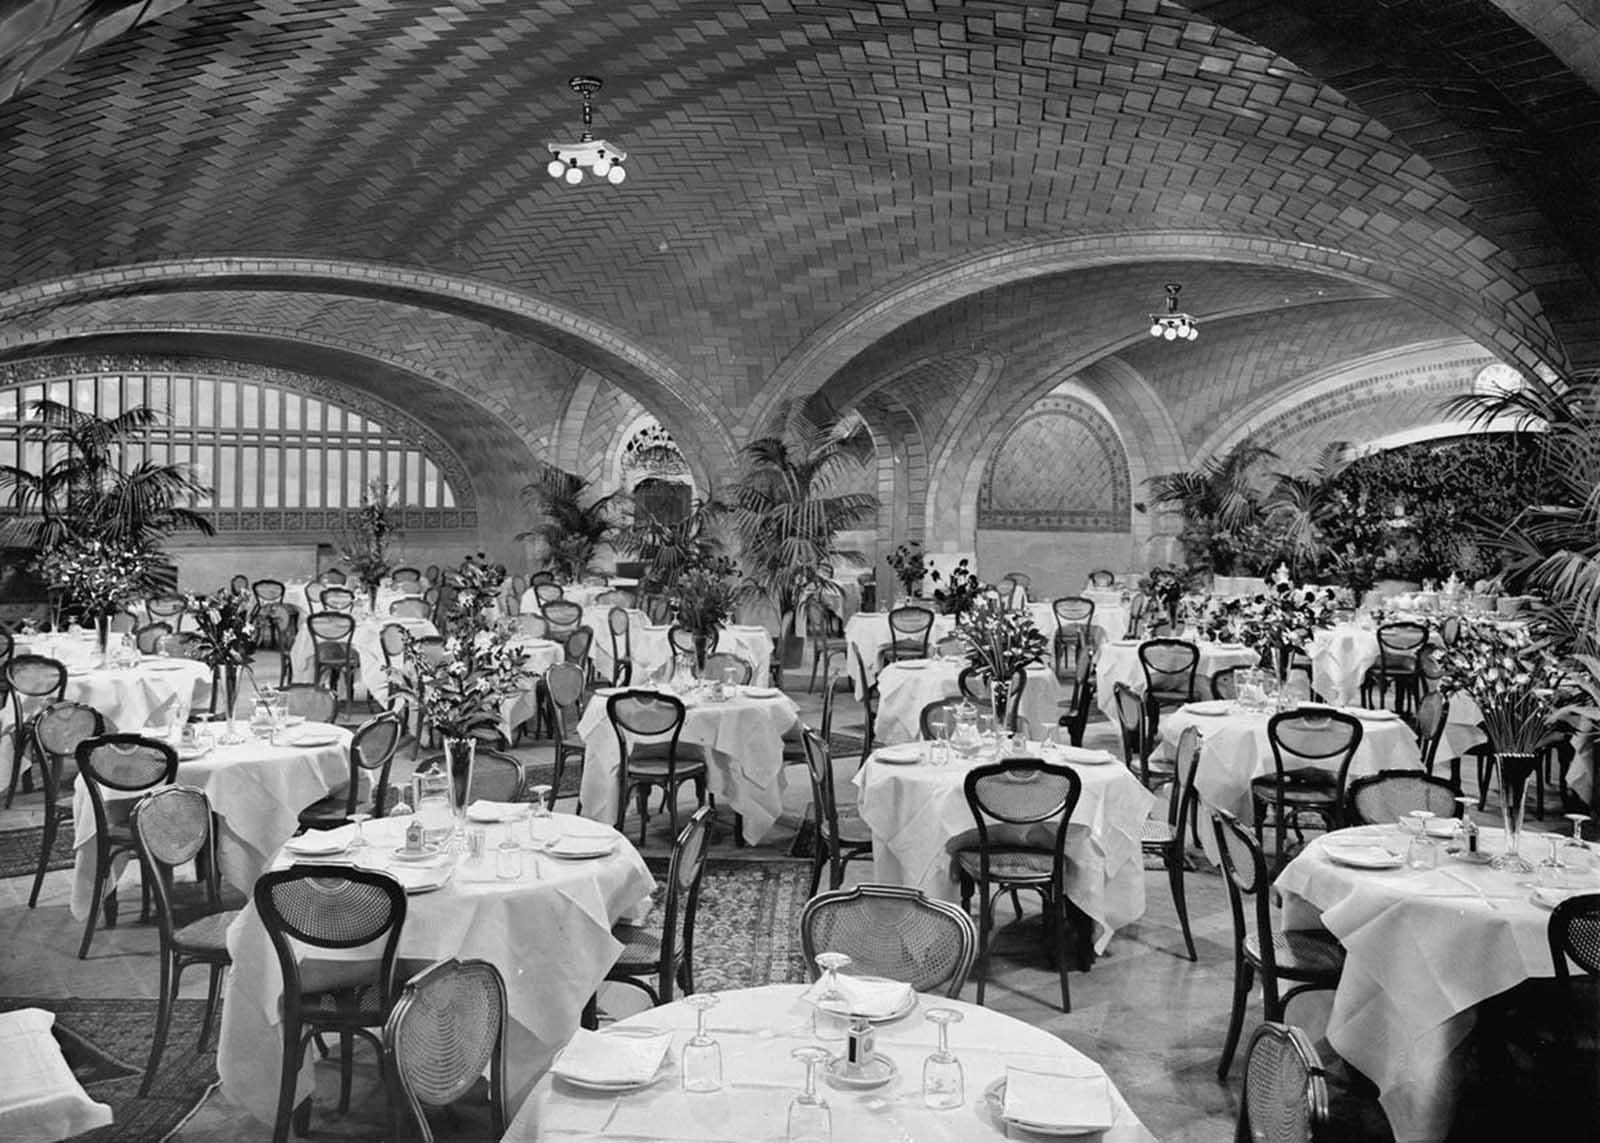 Restaurant, Grand Central Terminal, ca 1912.